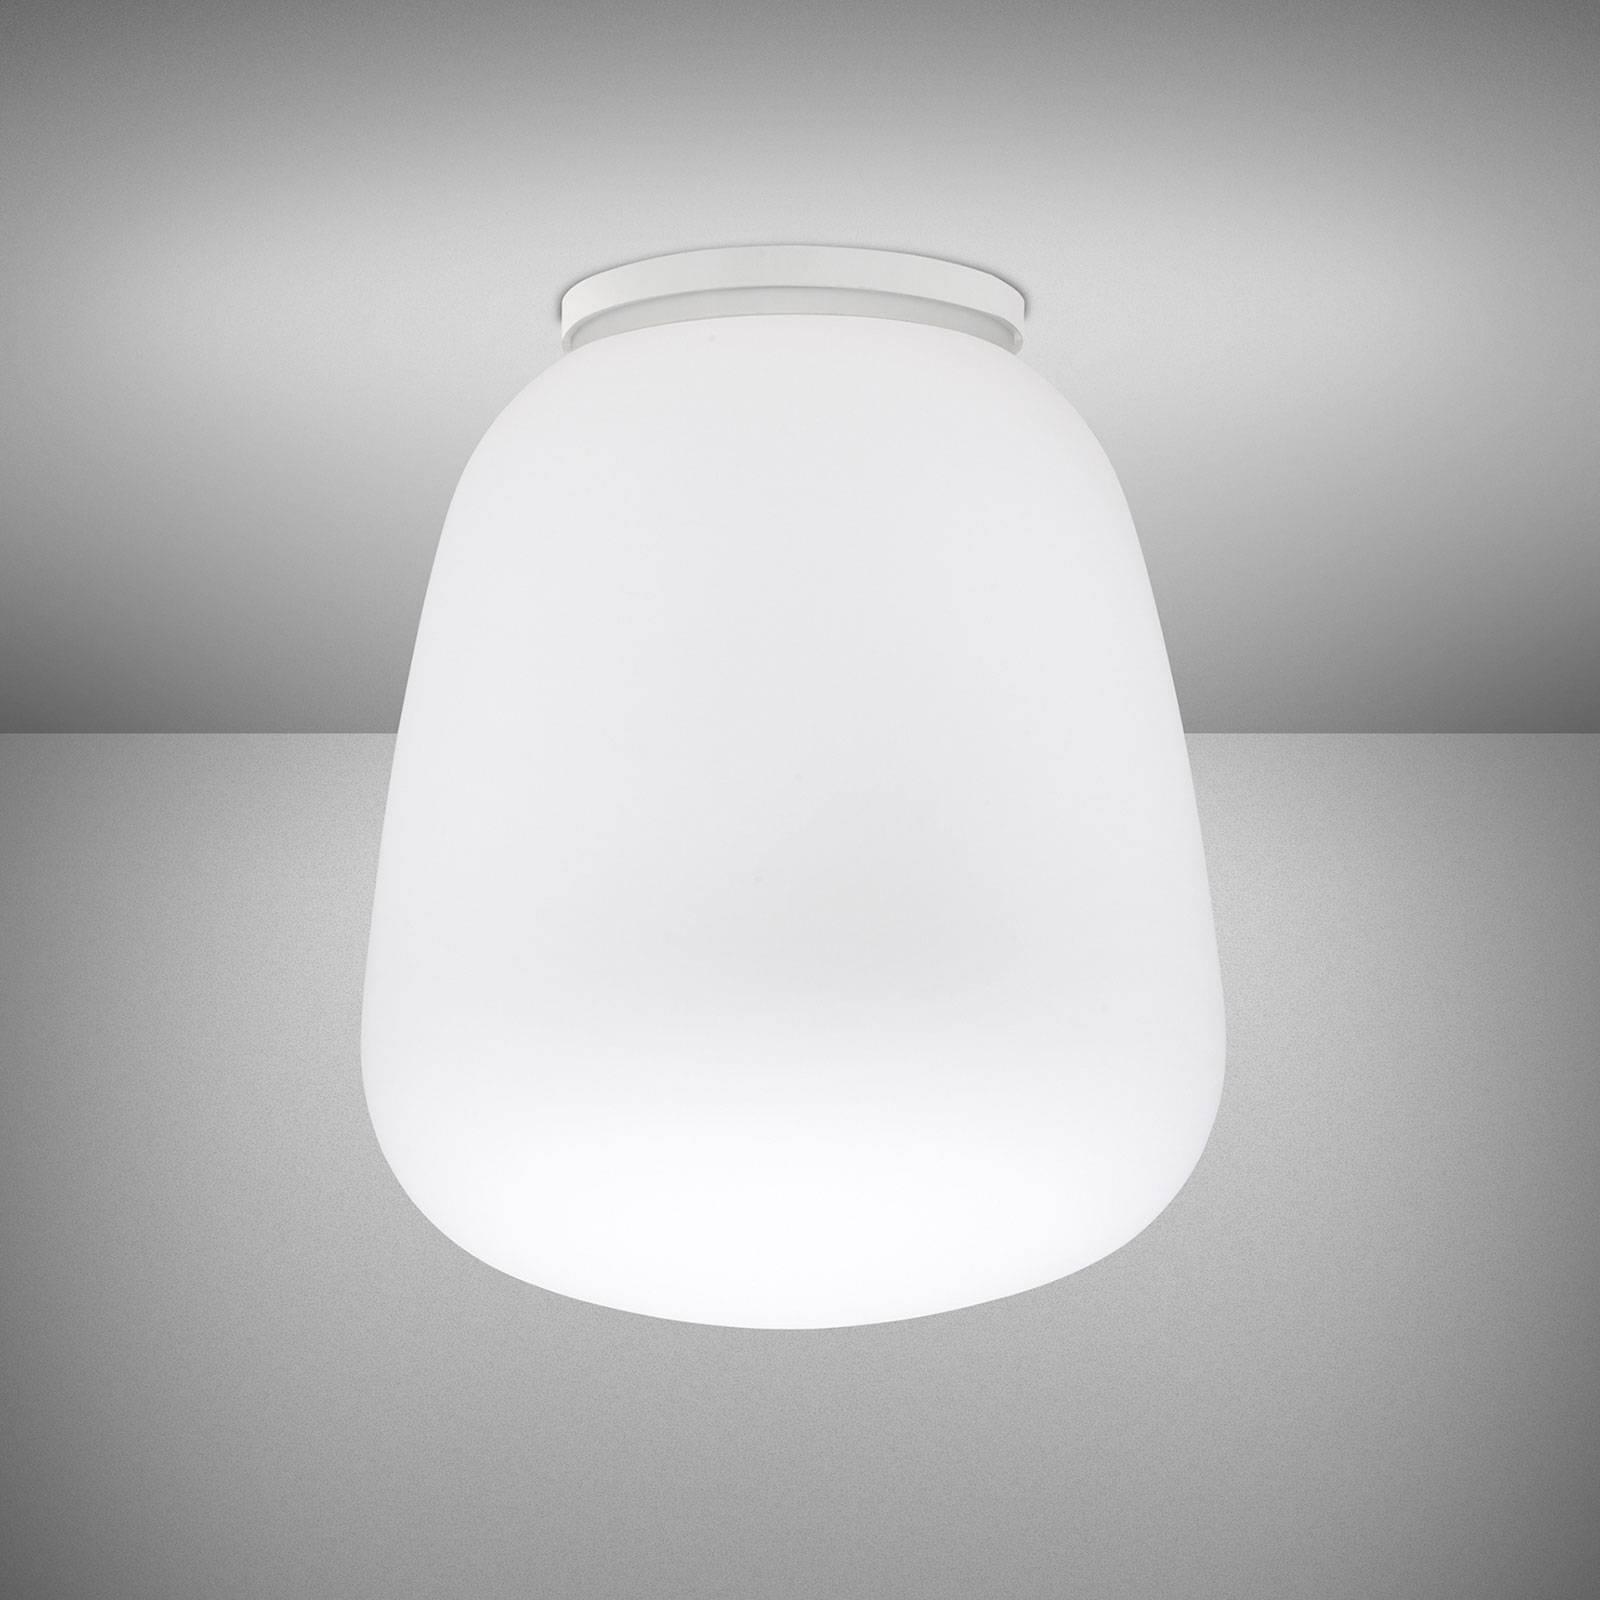 Fabbian Lumi Baka glas-plafondlamp, Ø 33 cm